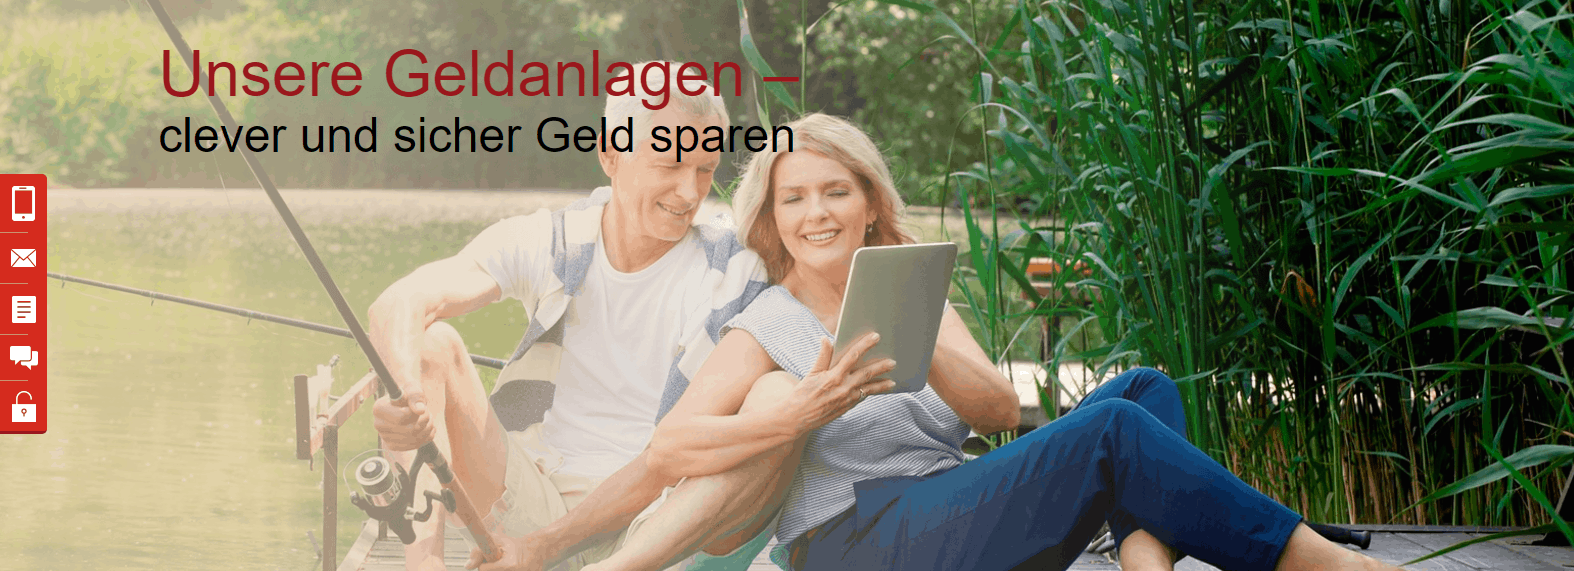 Oyak Anker Bank Festgeldkonto Test